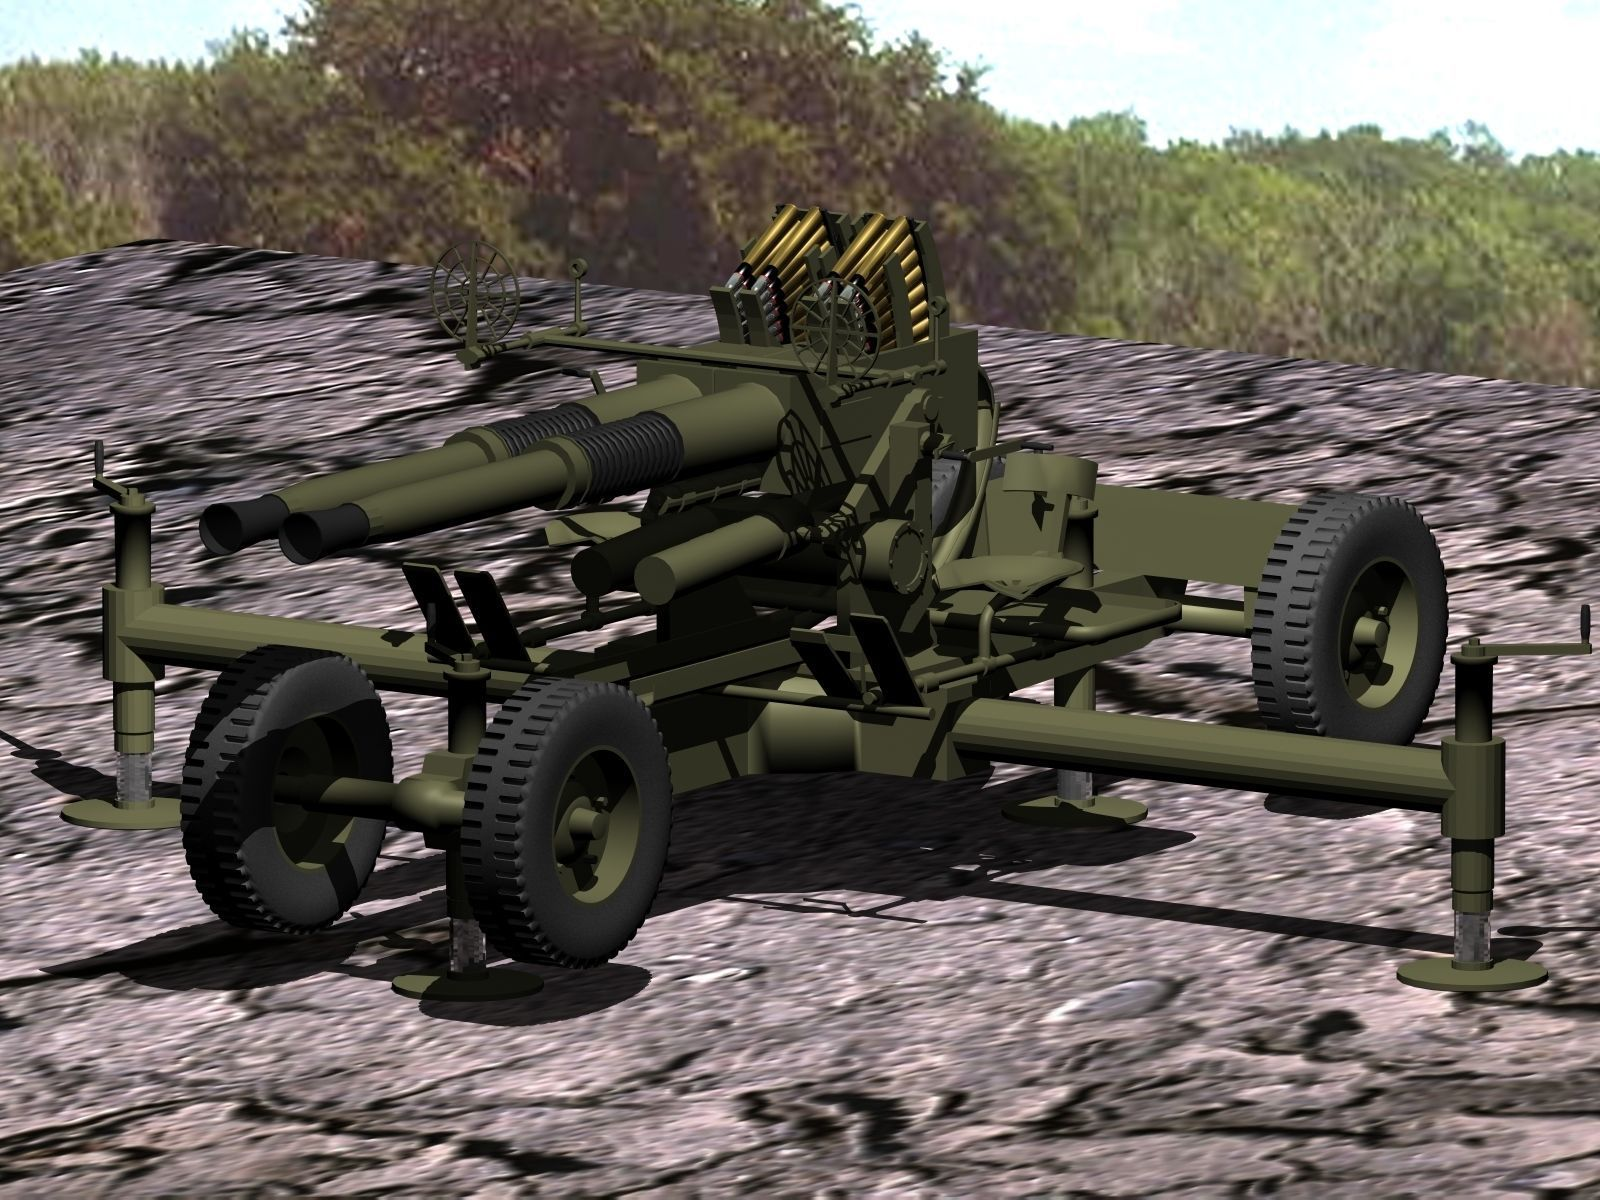 Bofors twin 40mm anti-aircraft gun printable